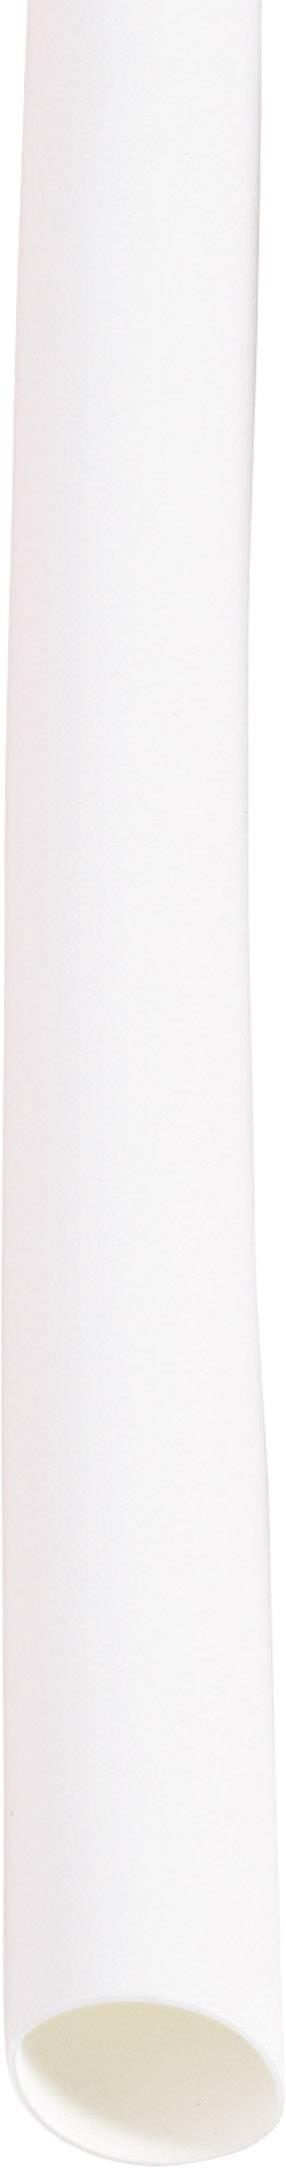 Smršťovací bužírka bez lepidla DSG Canusa 2890016902 2:1, -55 až +135 °C, 1.60 mm, bílá, metrové zboží